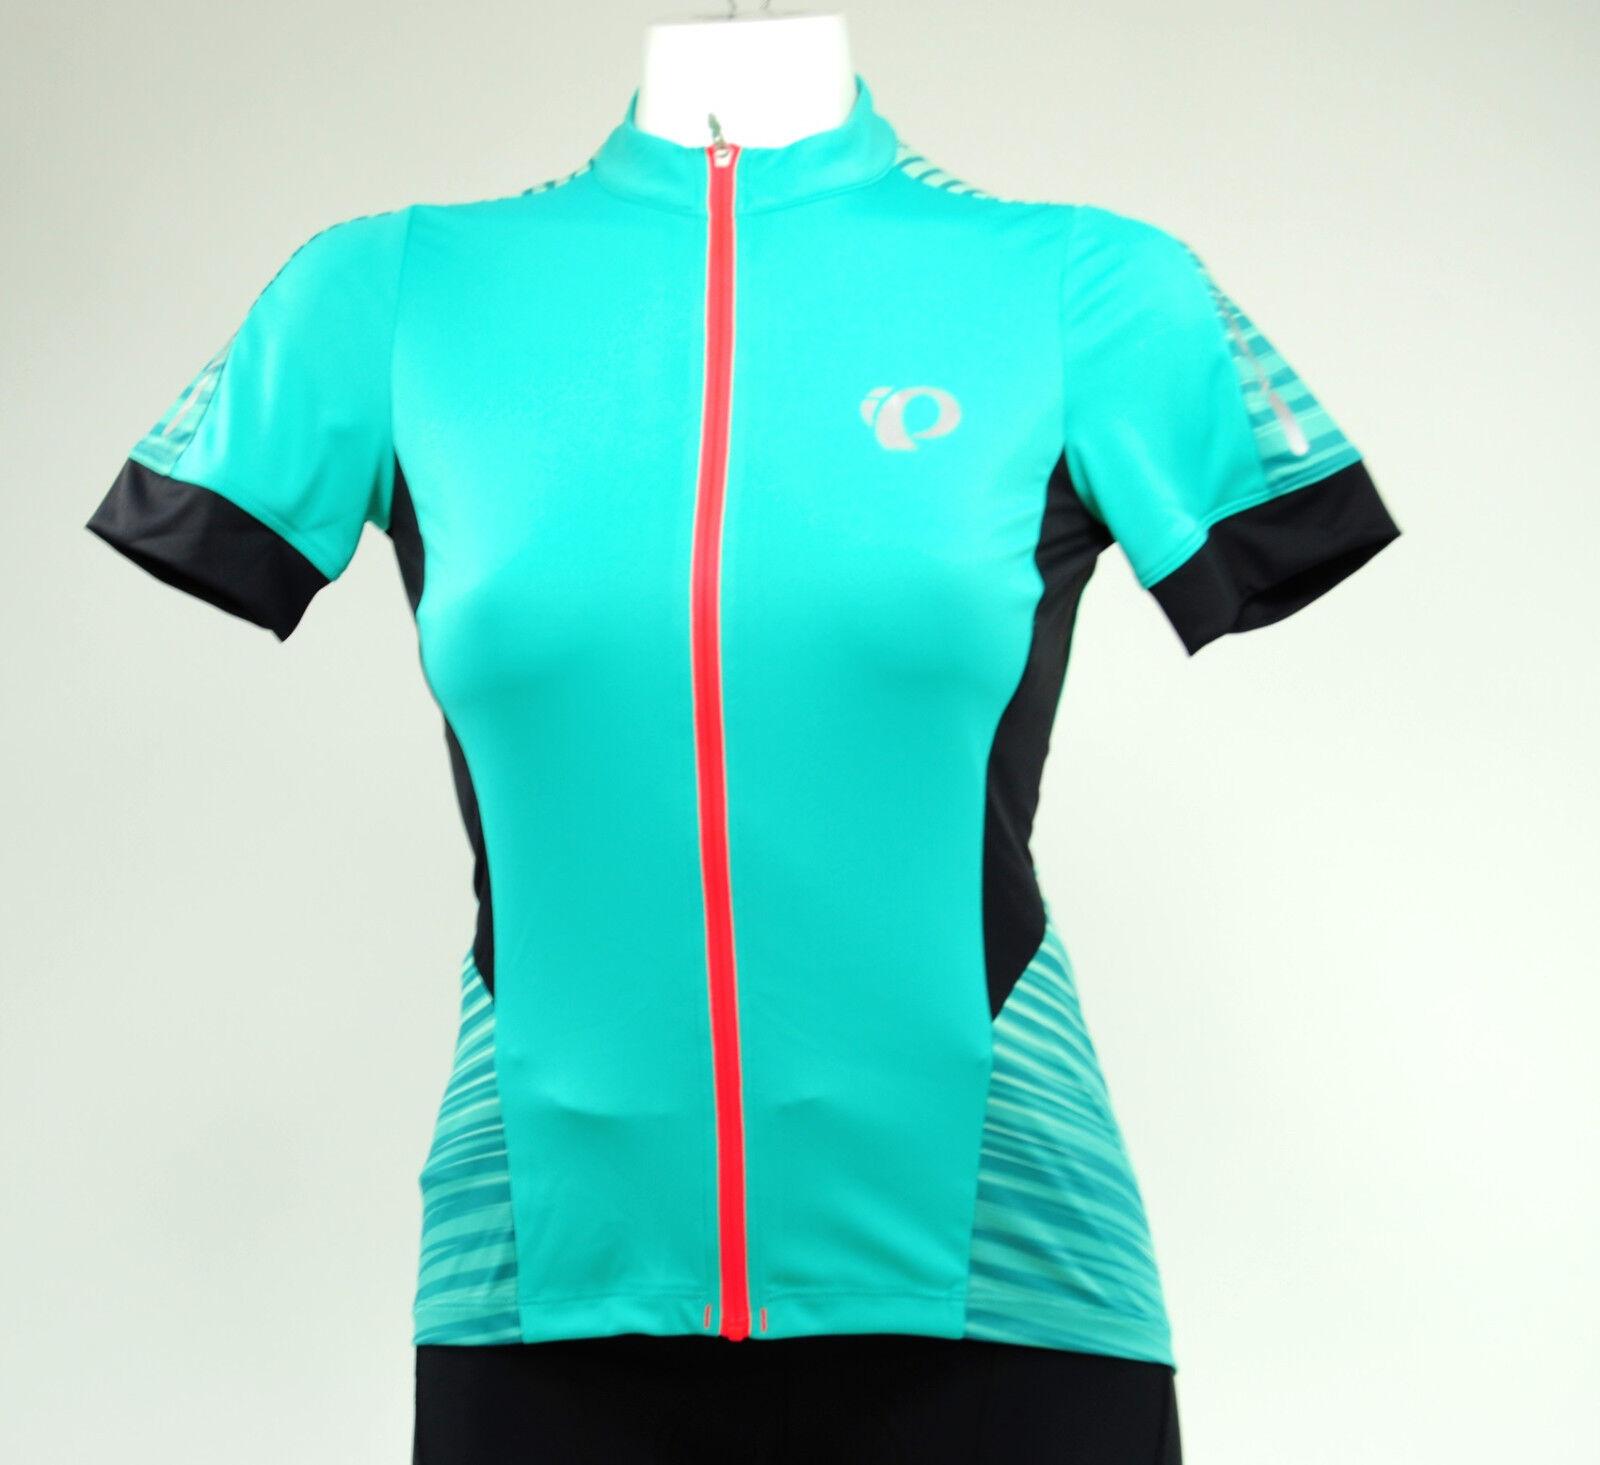 Pearl Izumi Women's Elite Pursuit SS Cycling Jersey, Atlantis Rush, Size Medium